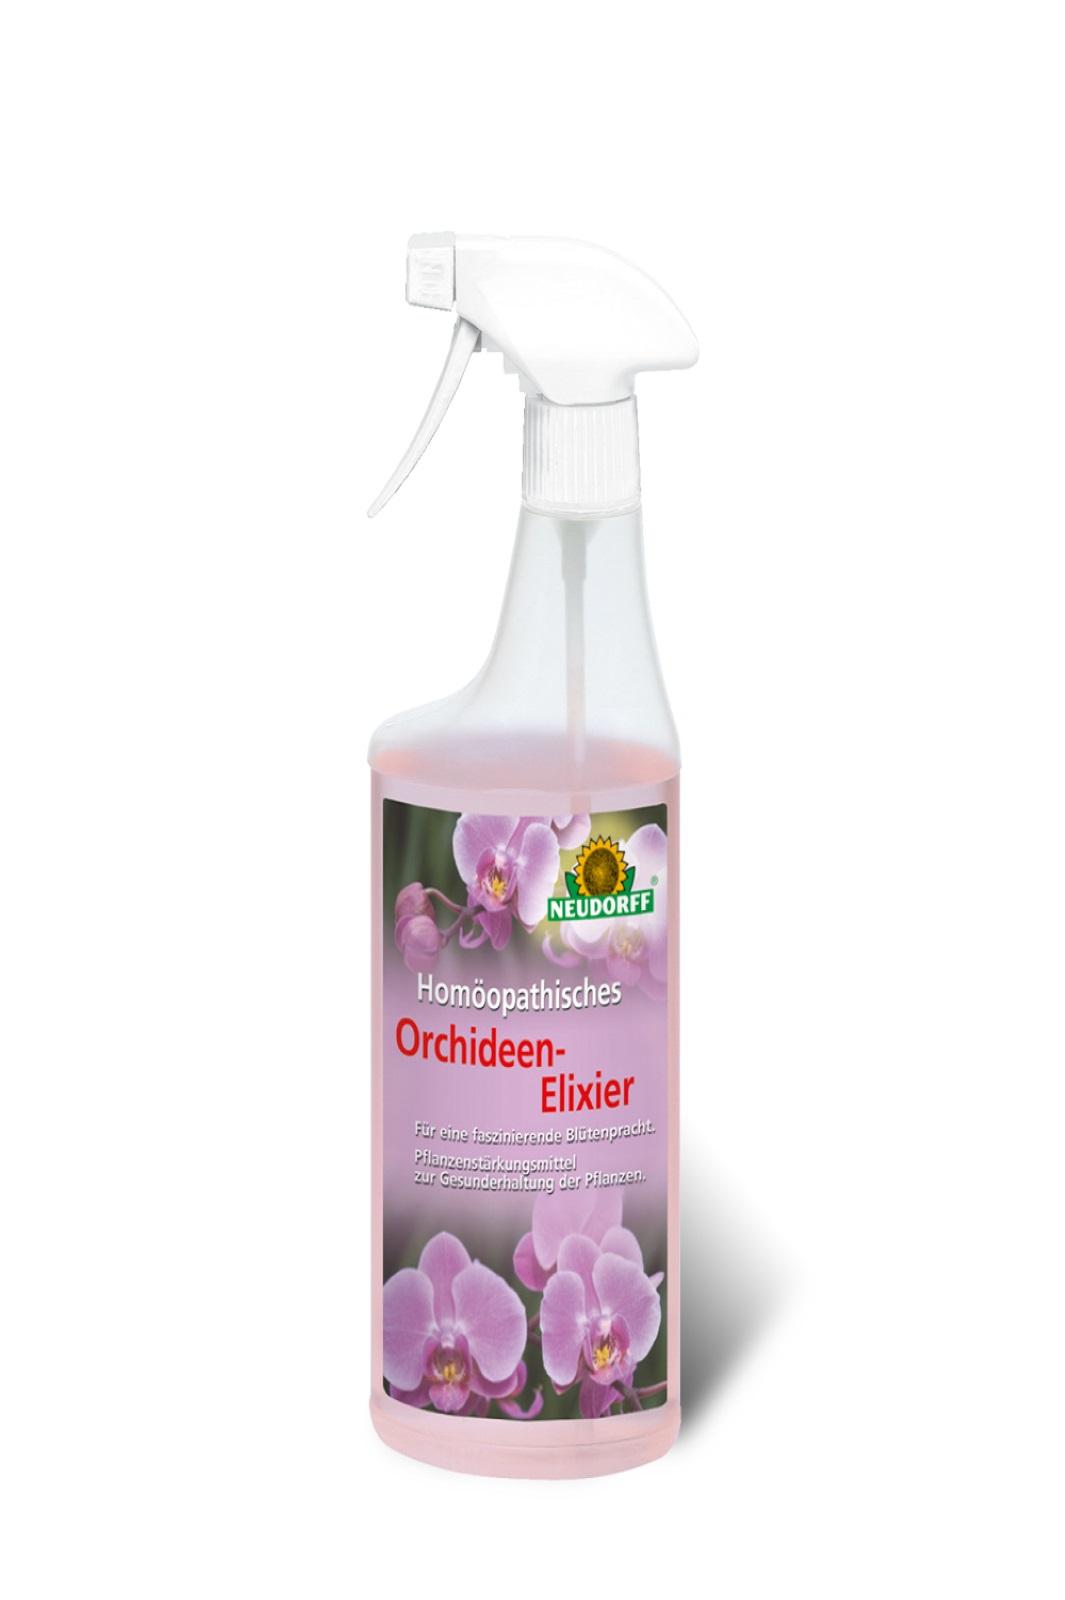 Homöopathisches Orchideen-Elixier Neudorff